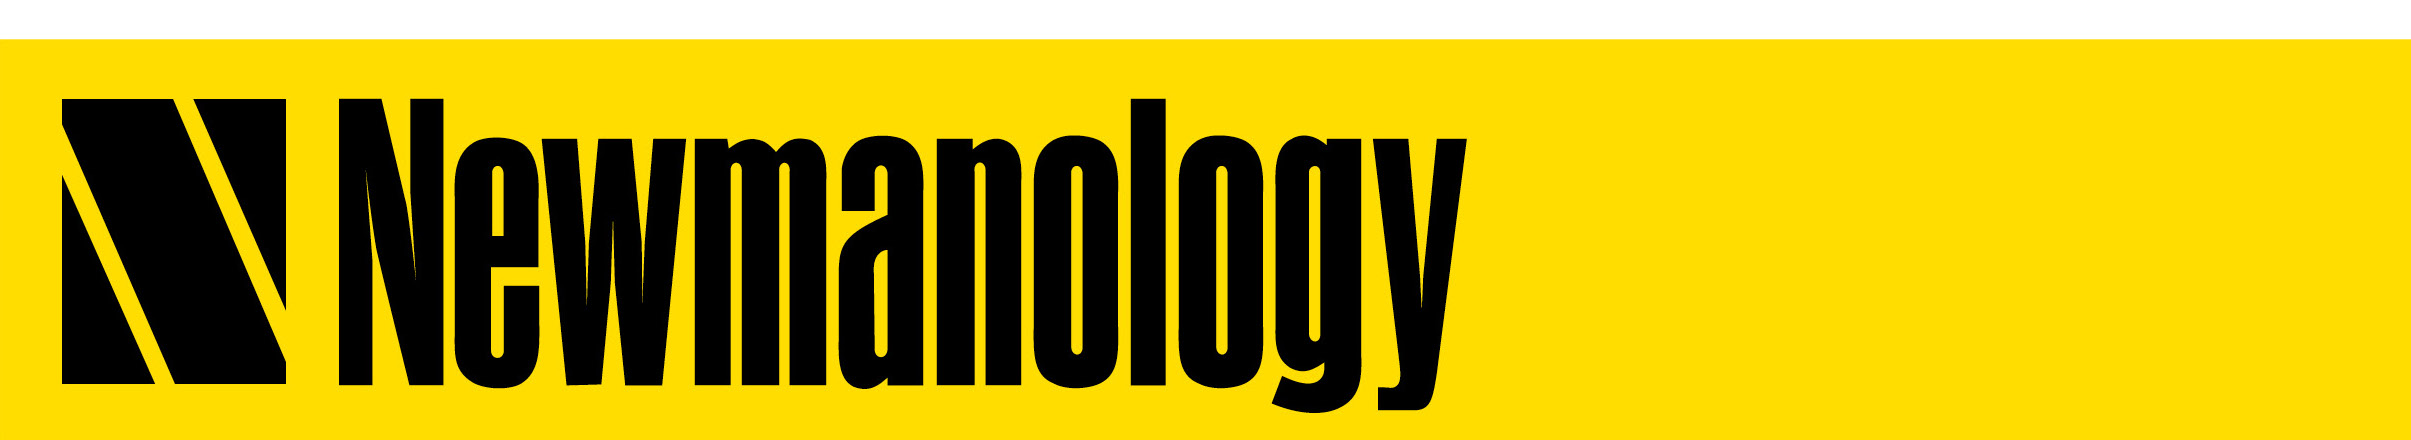 Newmanology